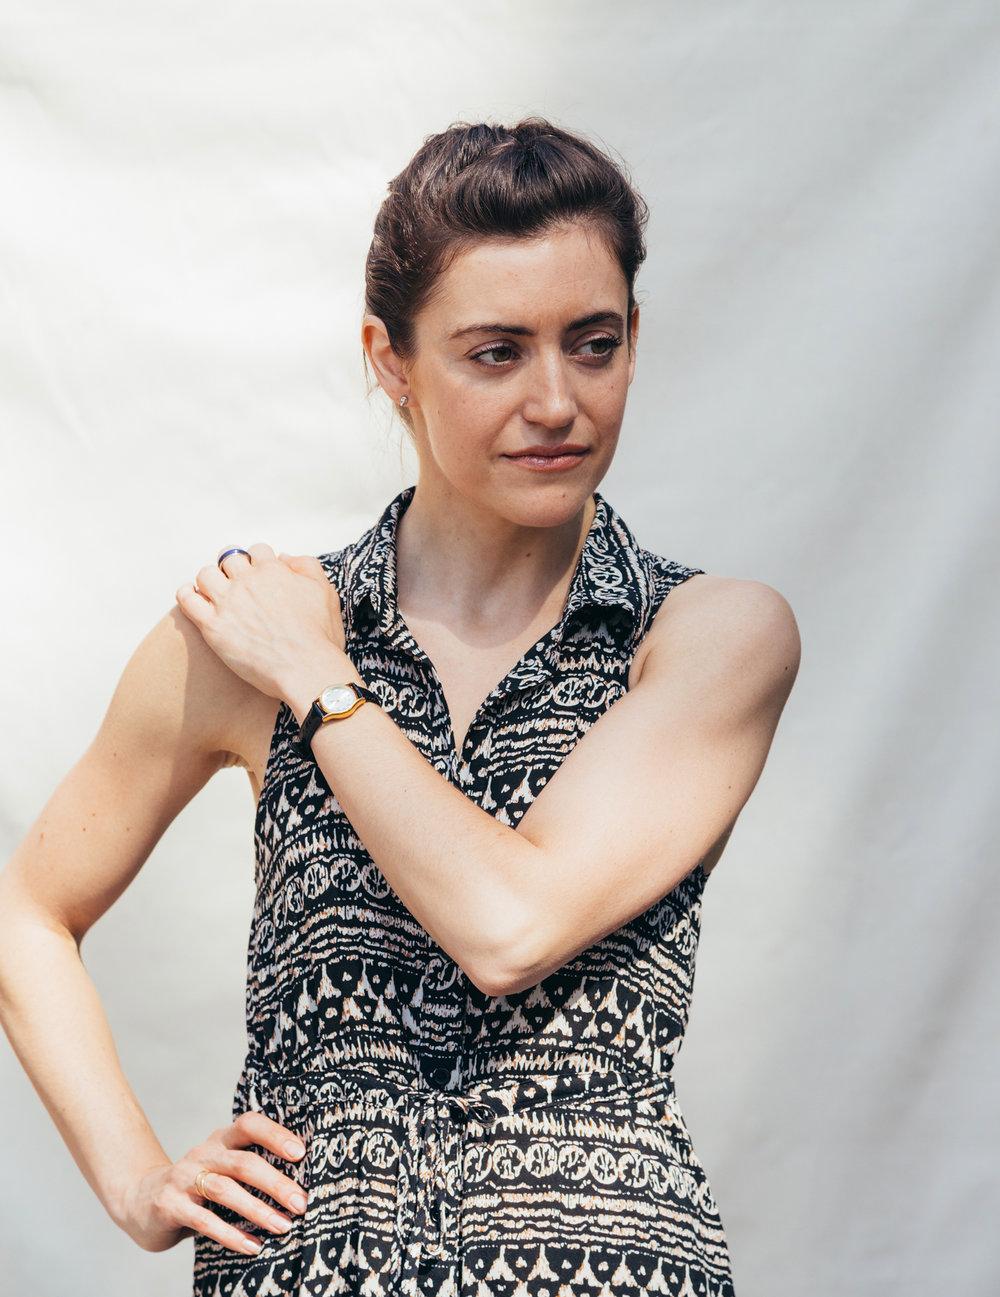 Carla Ciccone